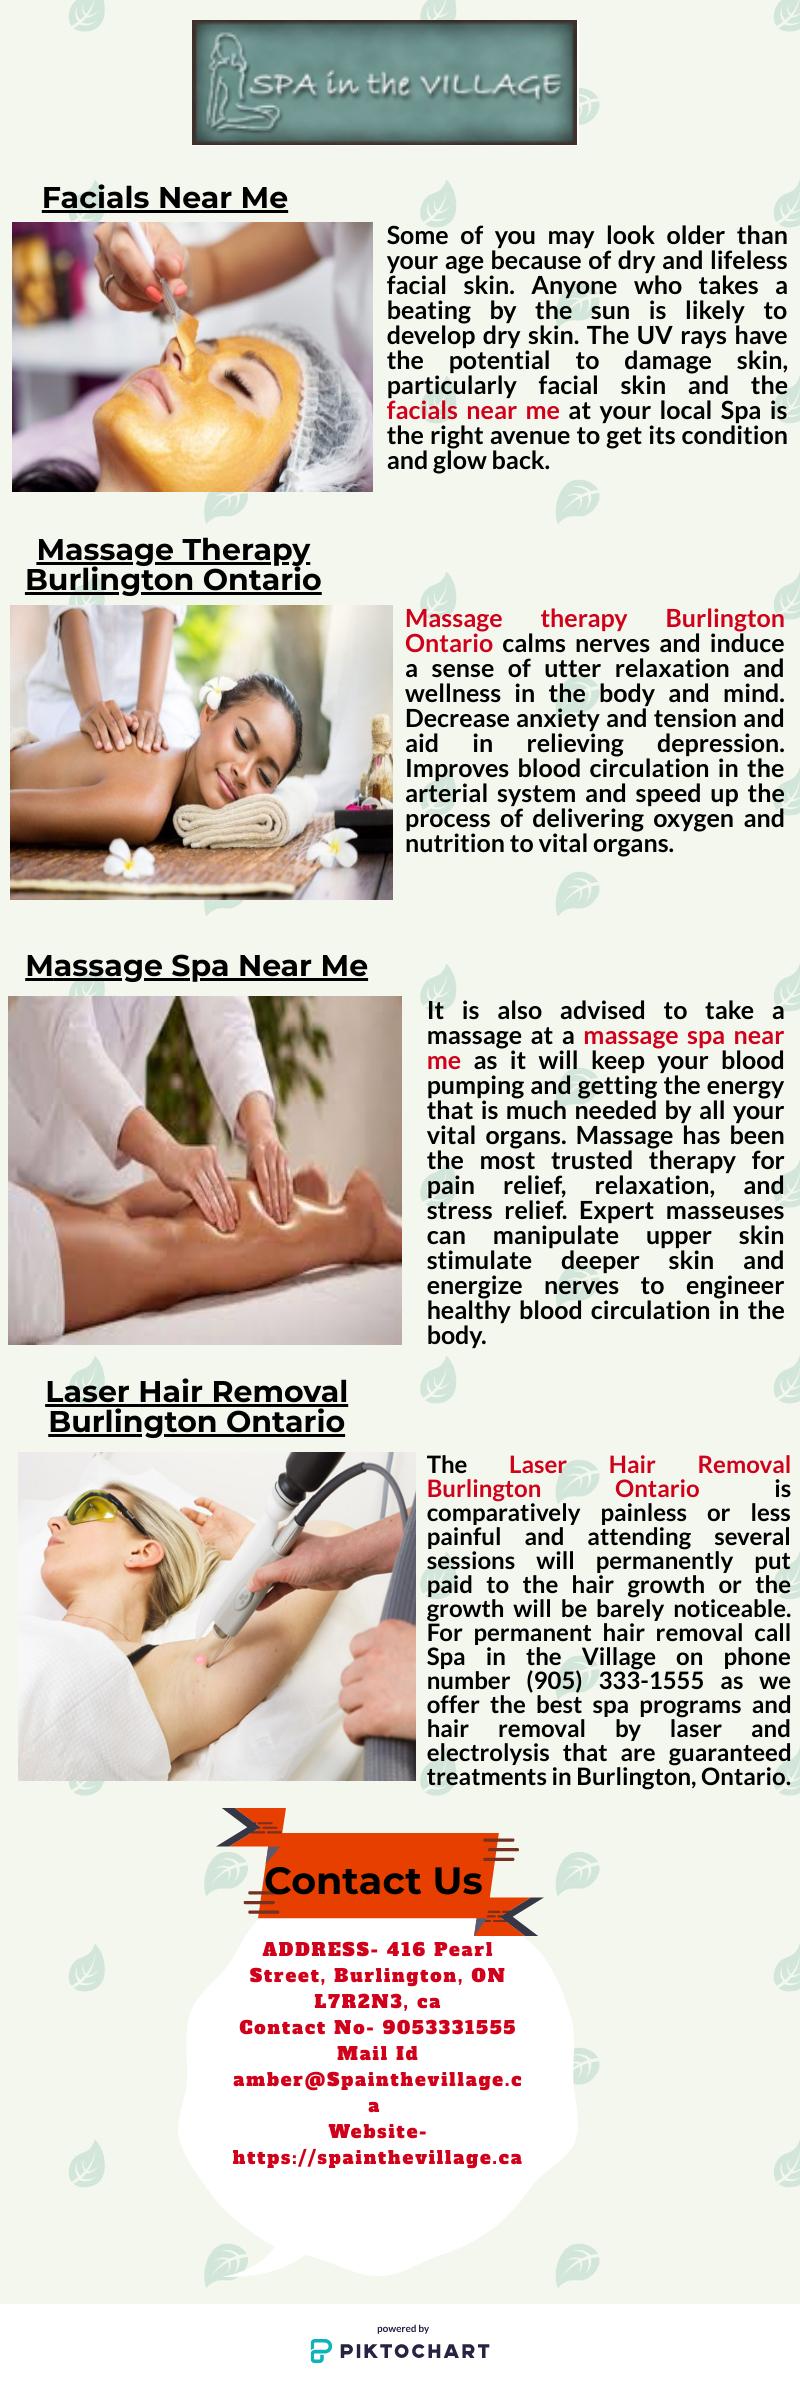 Facials Near Me Facial Couples Massage Facial Massage